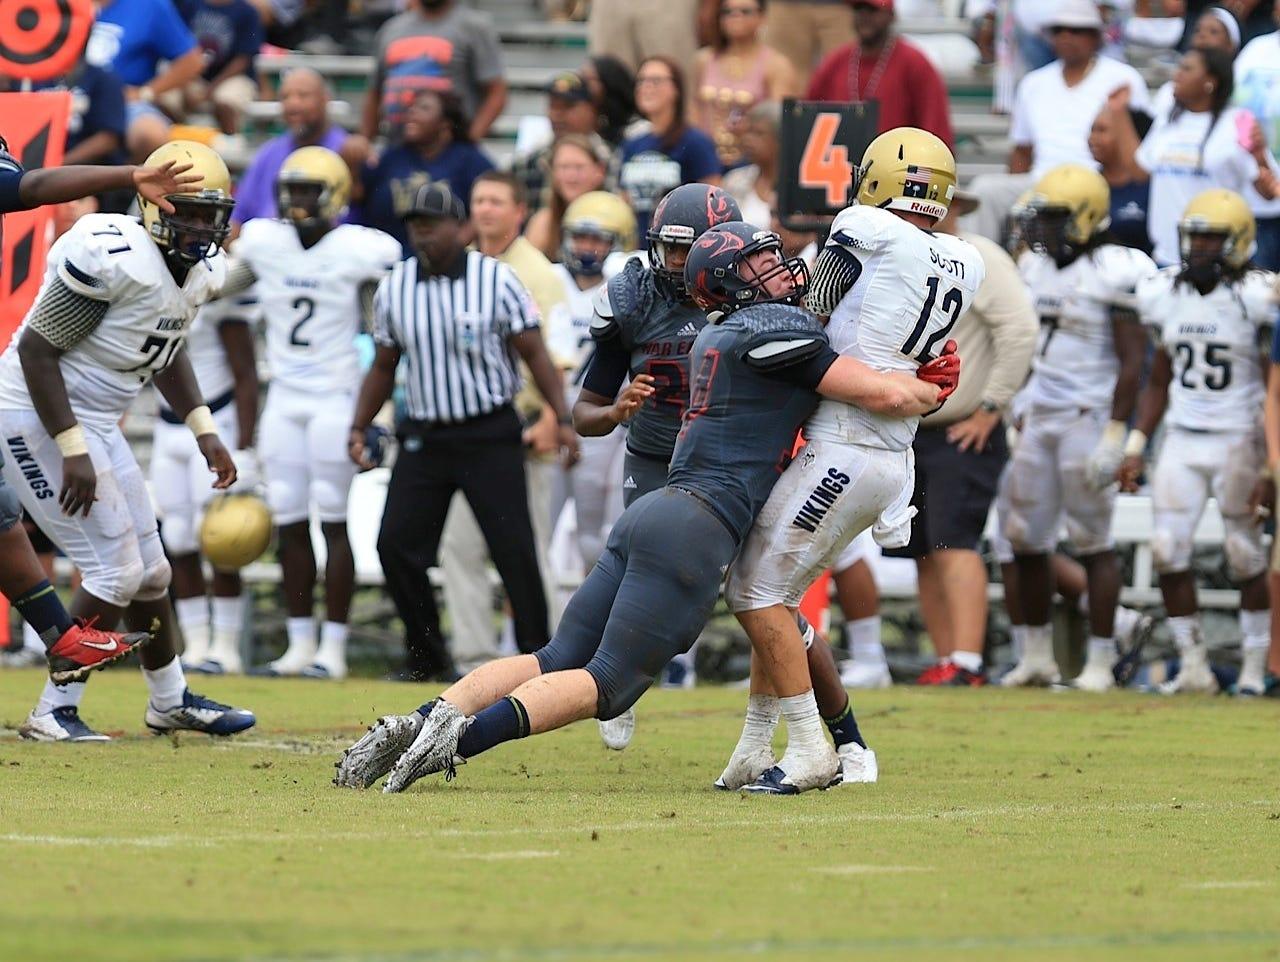 Spartanburg quarterback Austin Scott takes s smack from a Wakulla defender during Saturday's televised game on ESPN U.